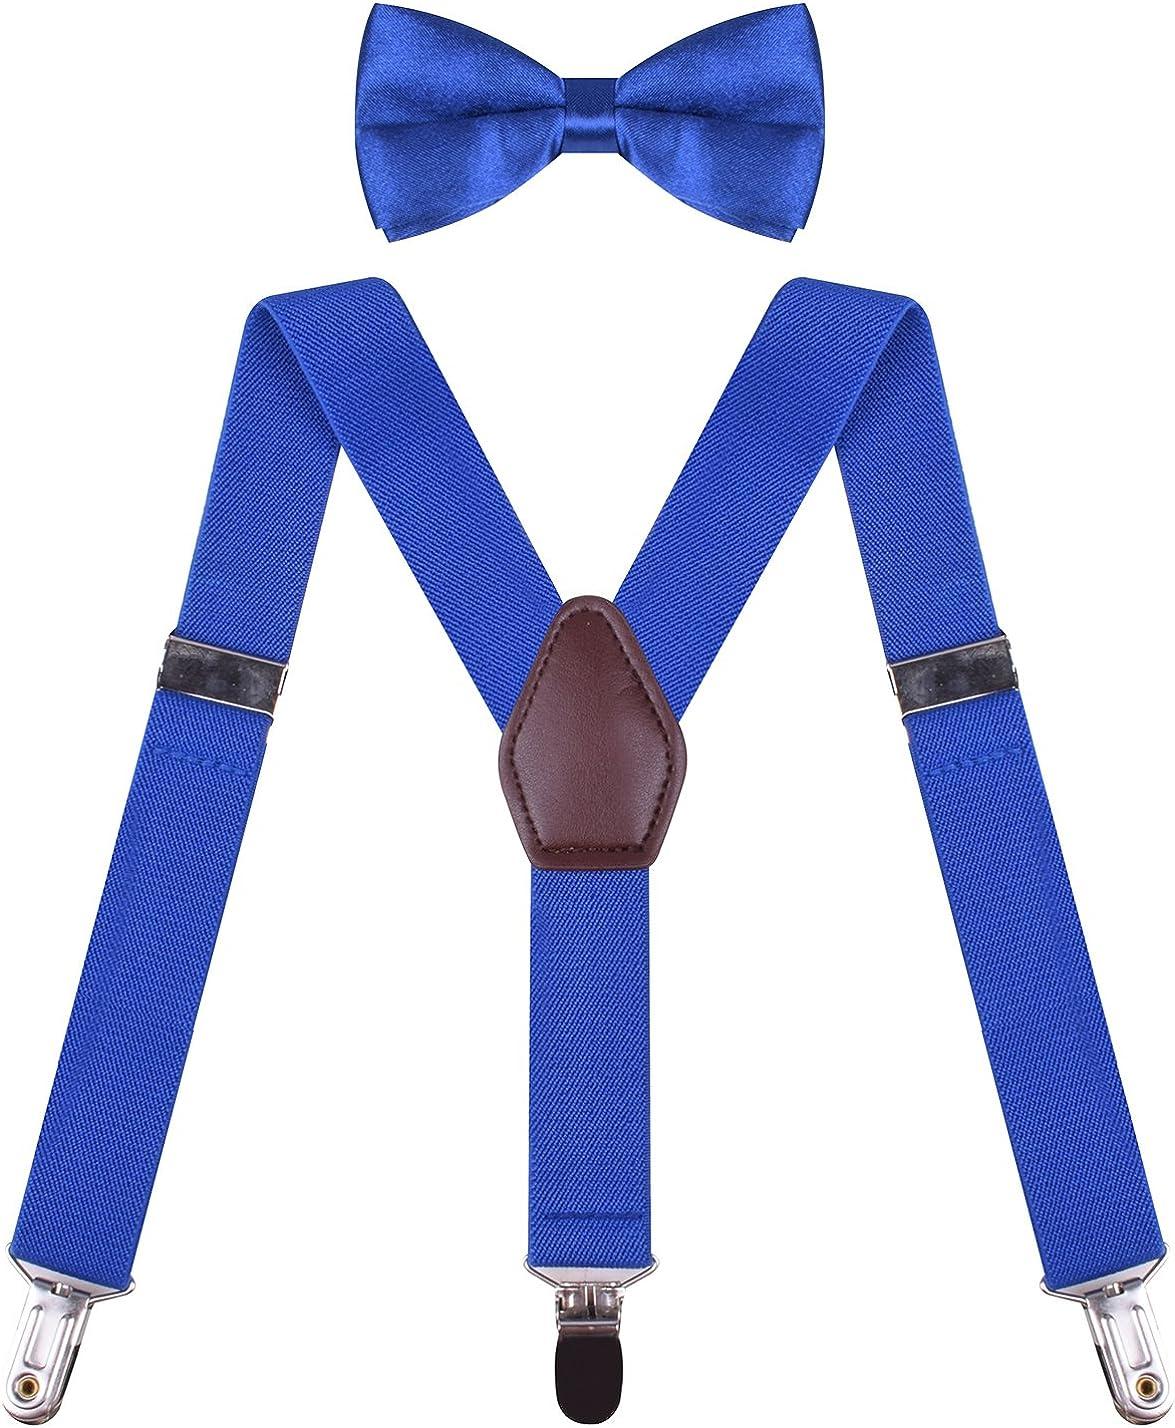 ORSKY Boys Suspenders with Bow Tie Set Adjustable Y Back